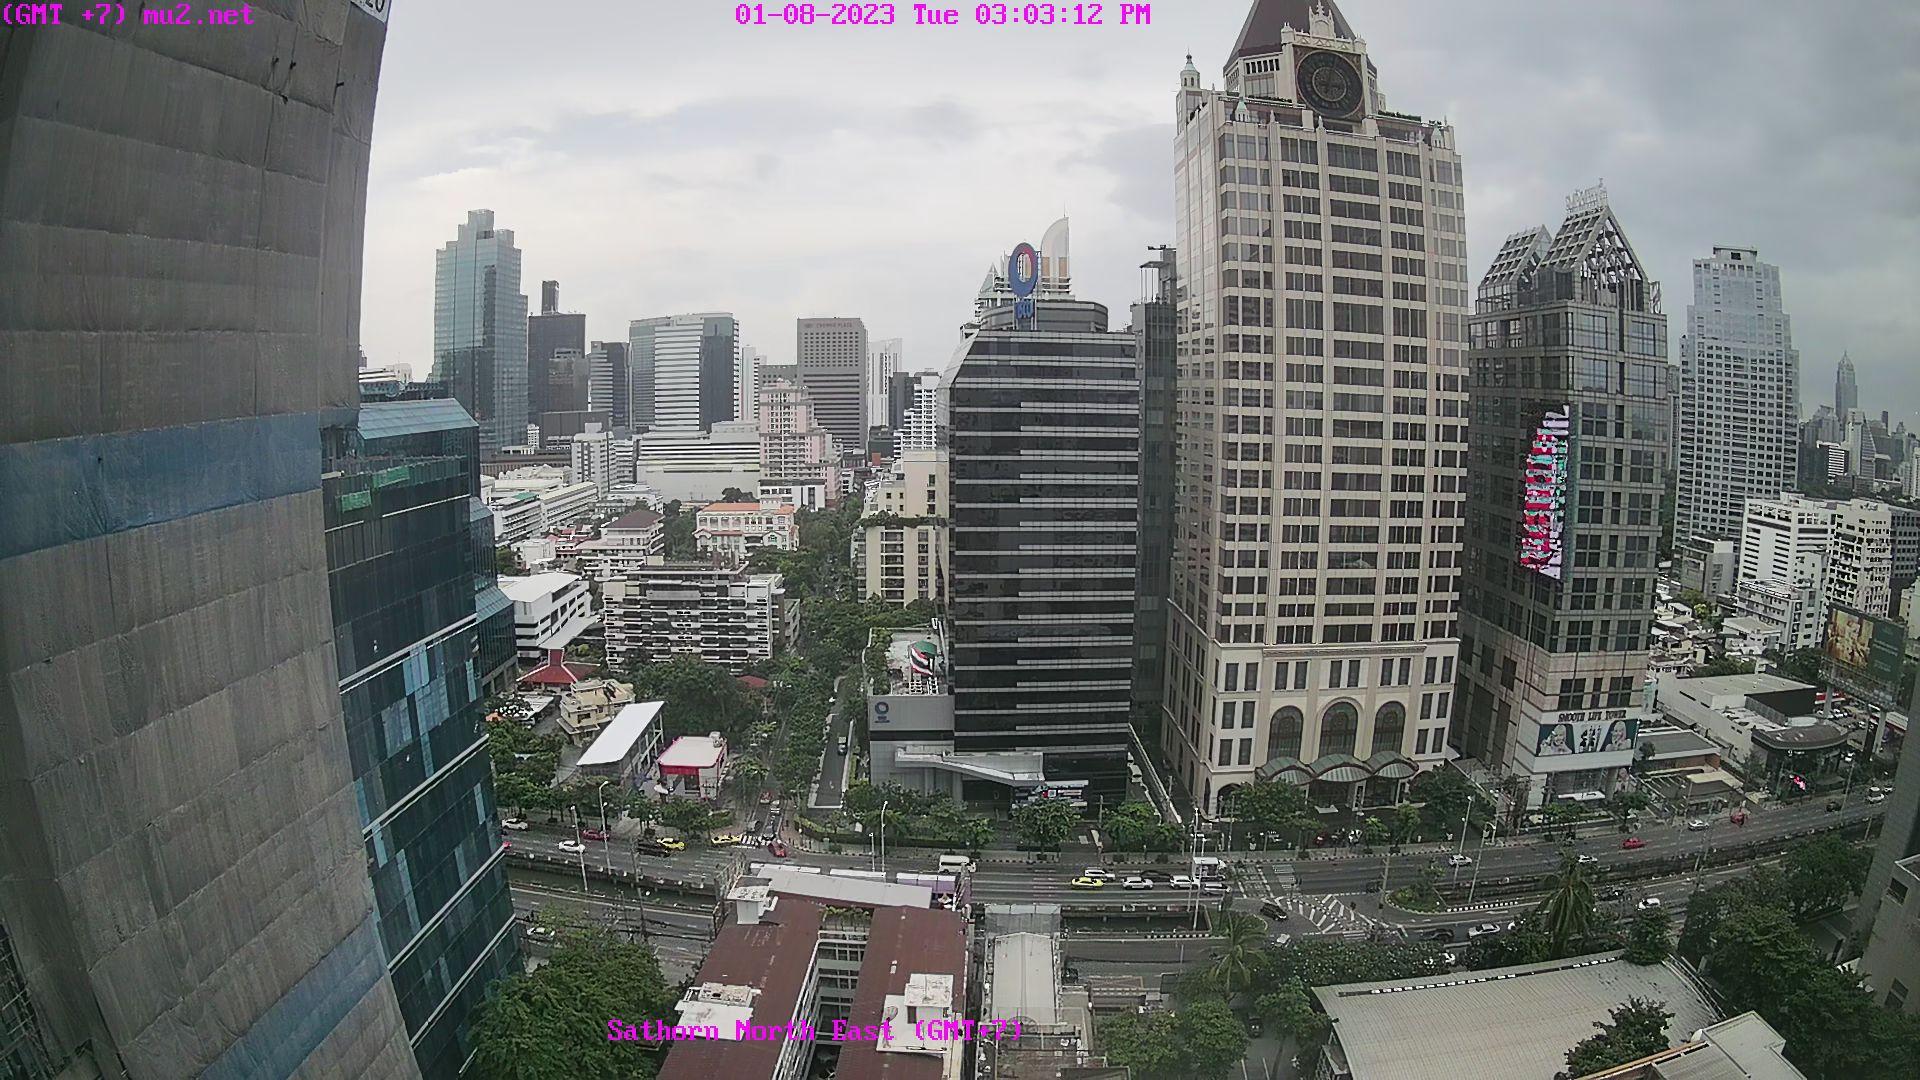 Bangkok Mon. 15:09